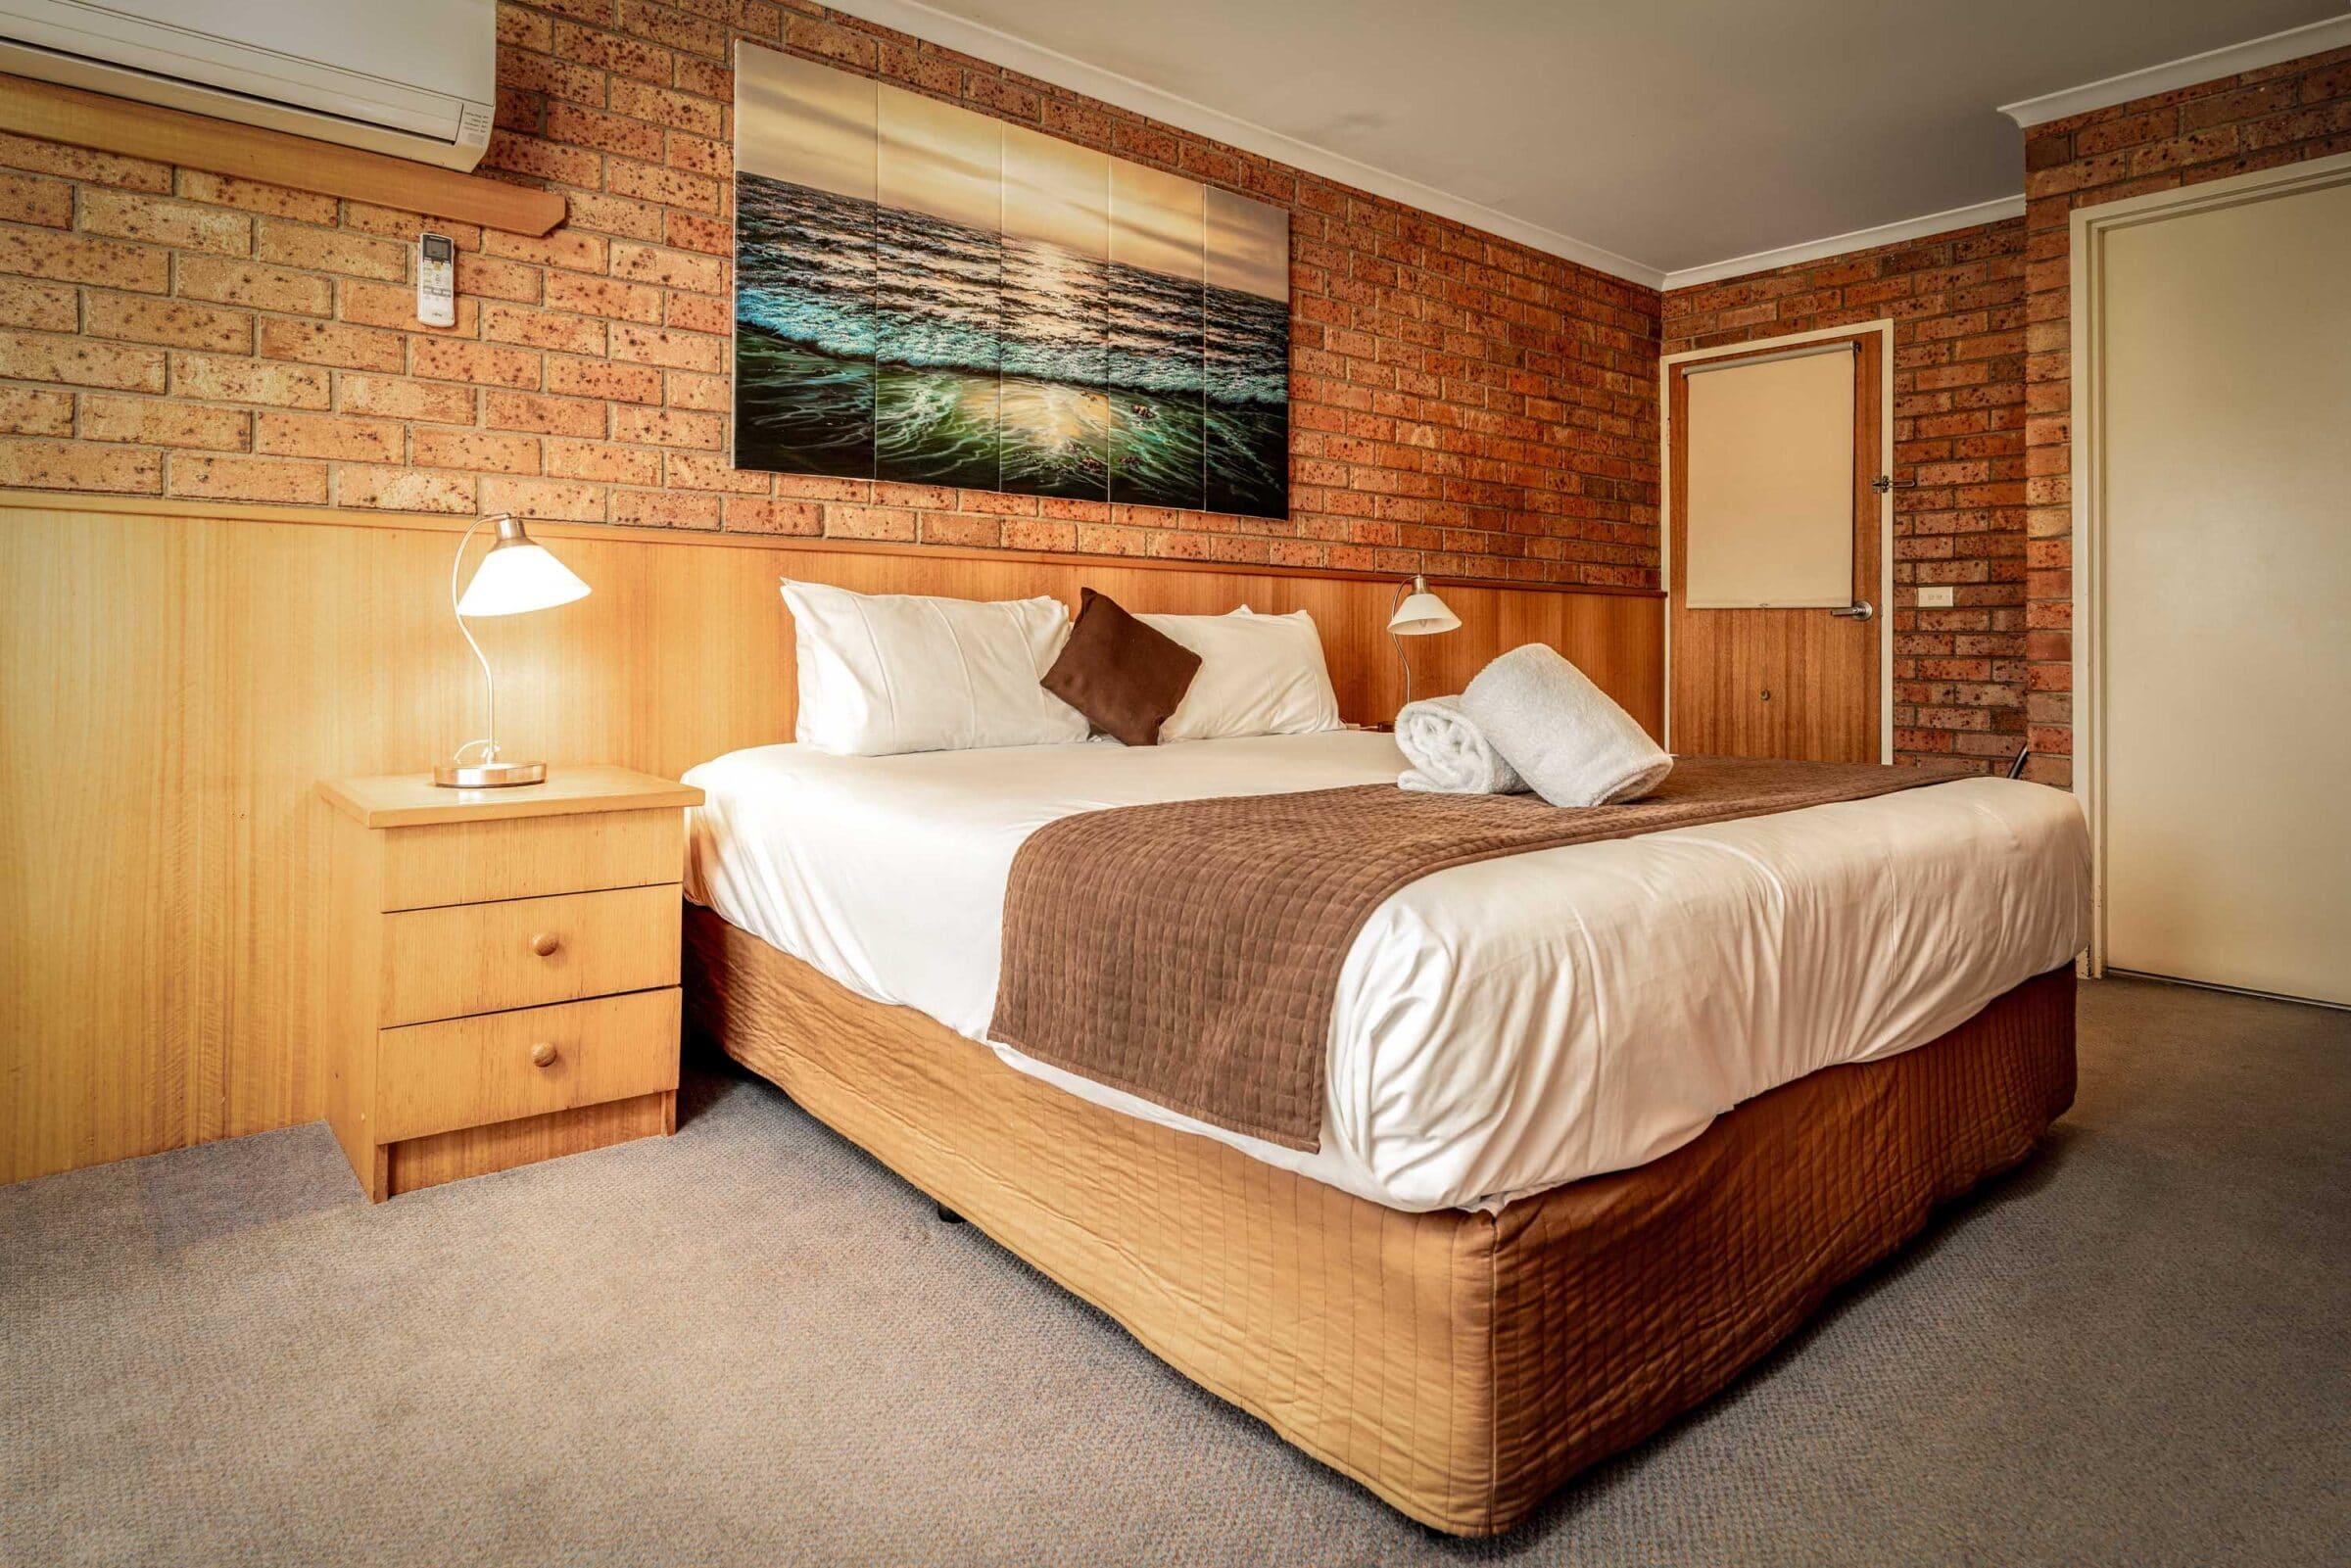 10-Main Bedroom-10 Small Suite Merimbula Motel Accommodation - Comfort Inn Merimbula